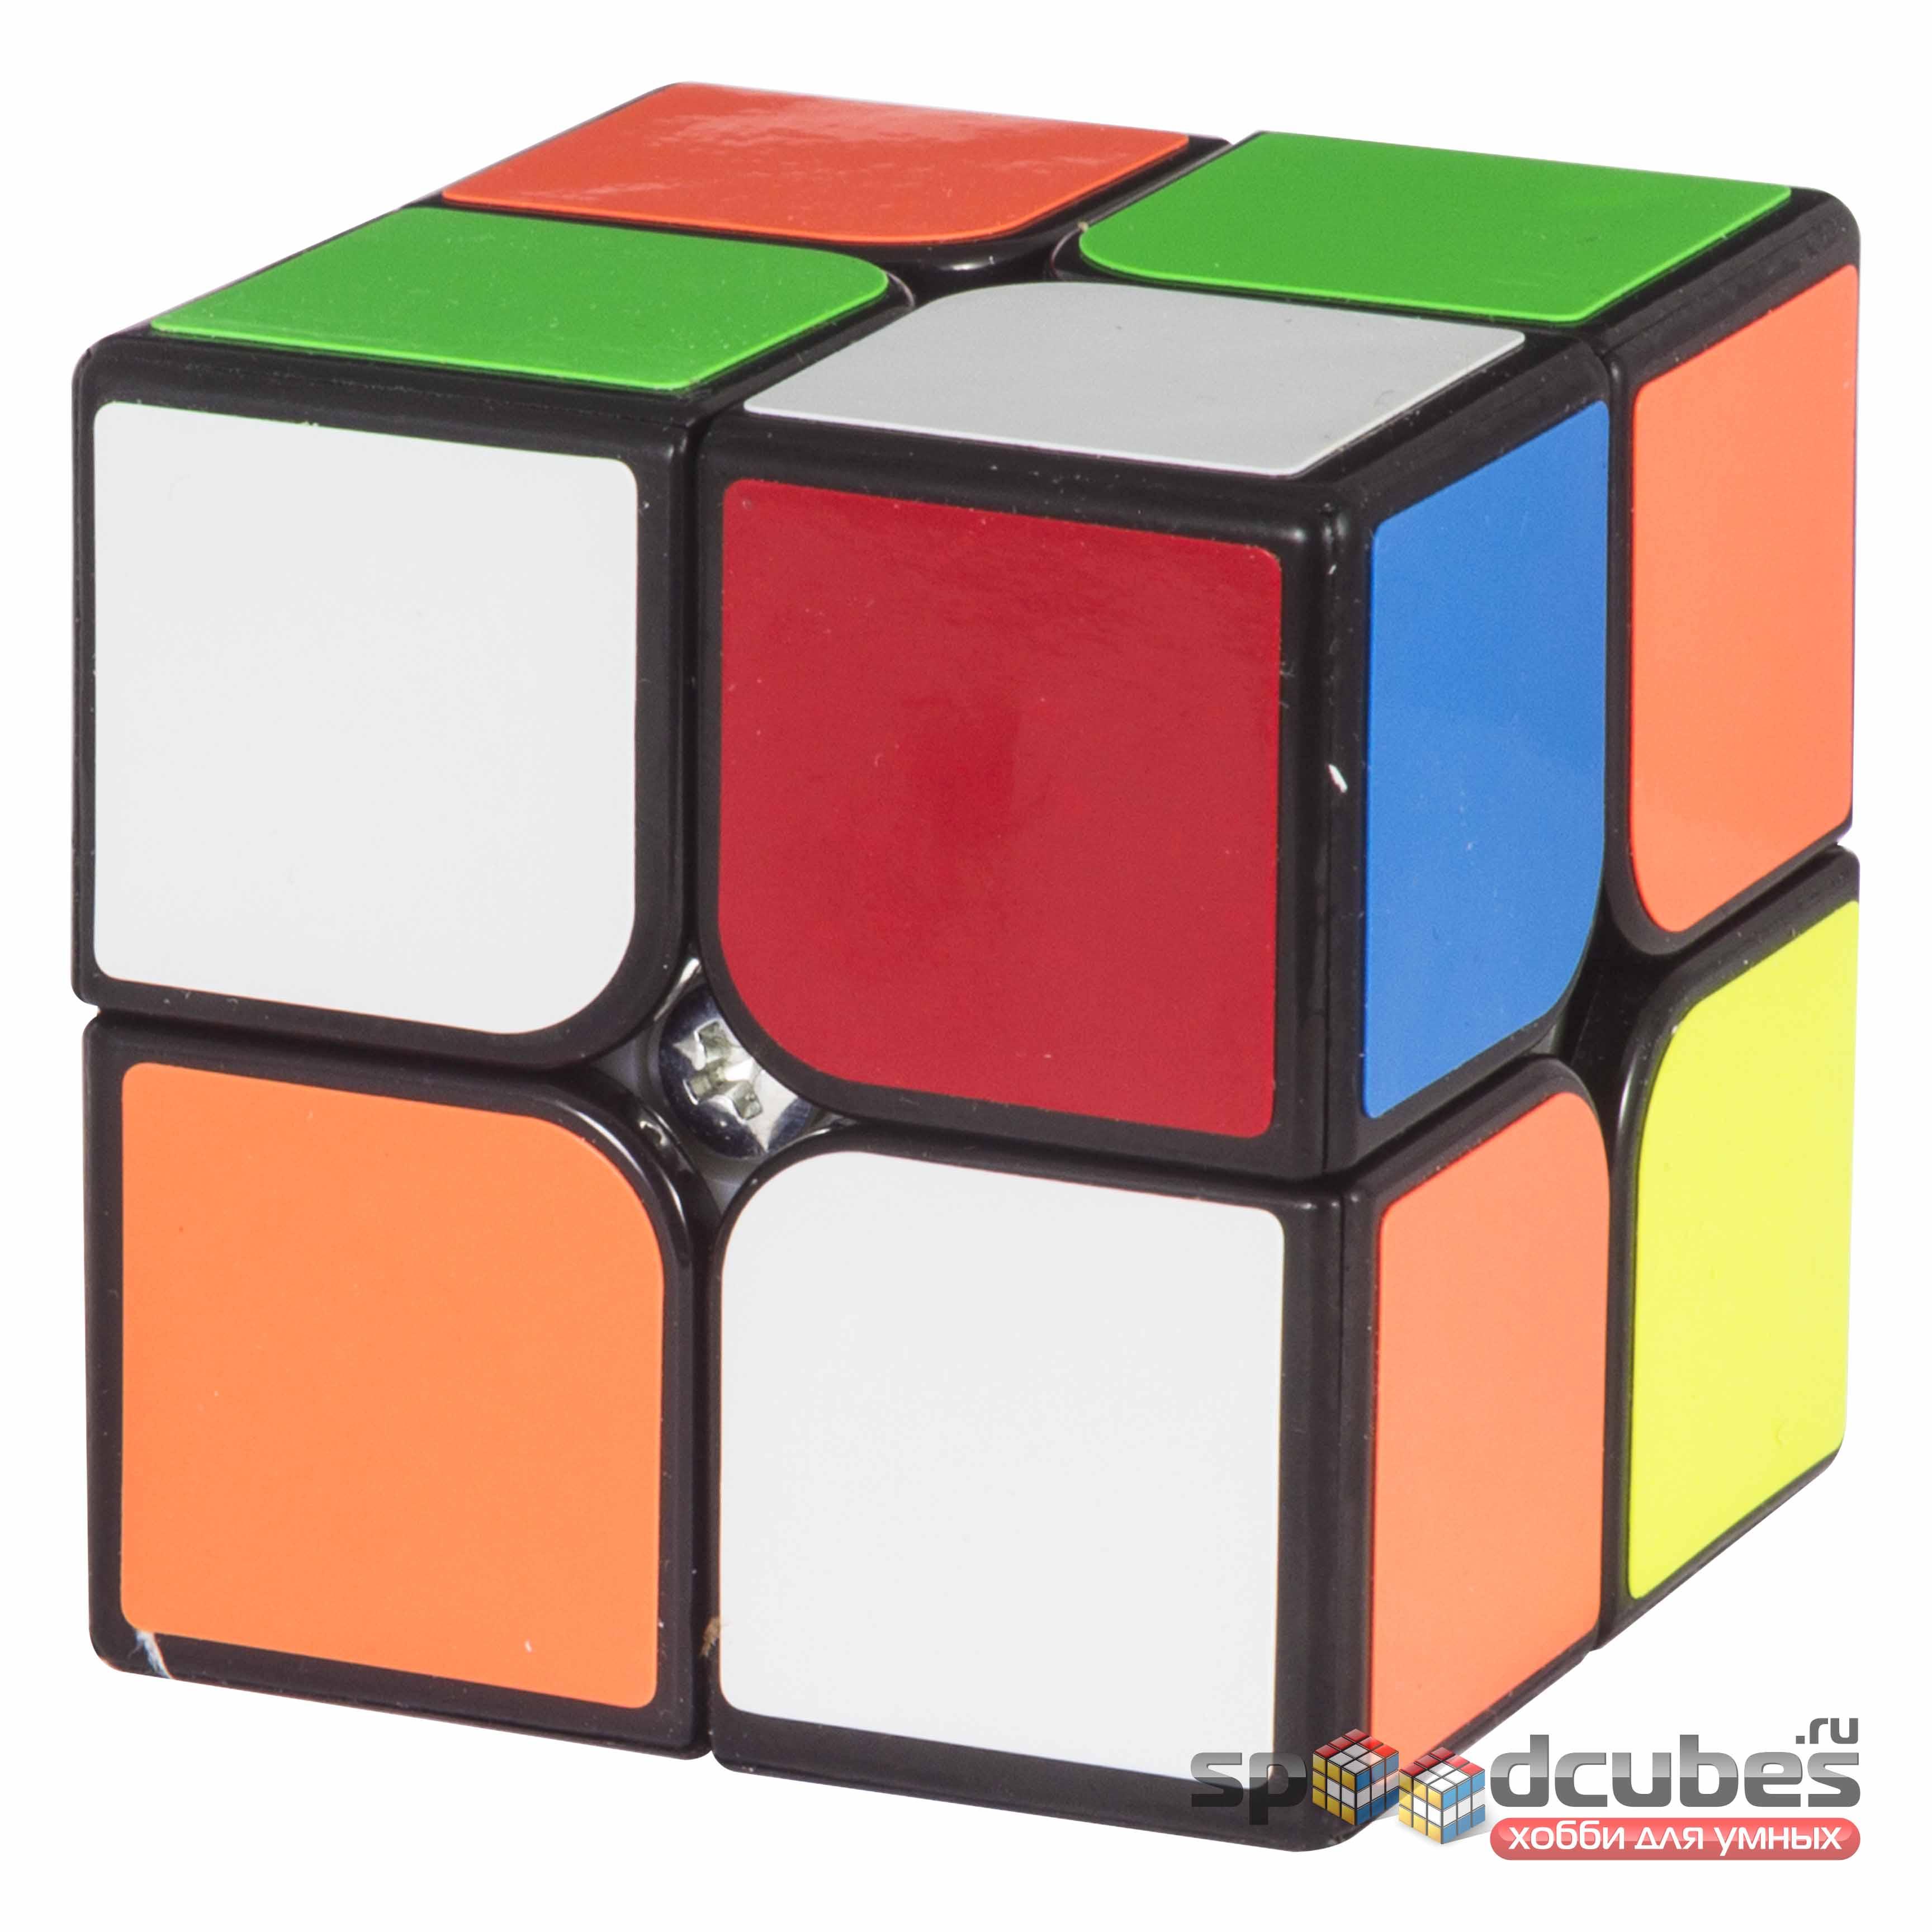 MoYu (YJ) 2x2x2 Yupo 3